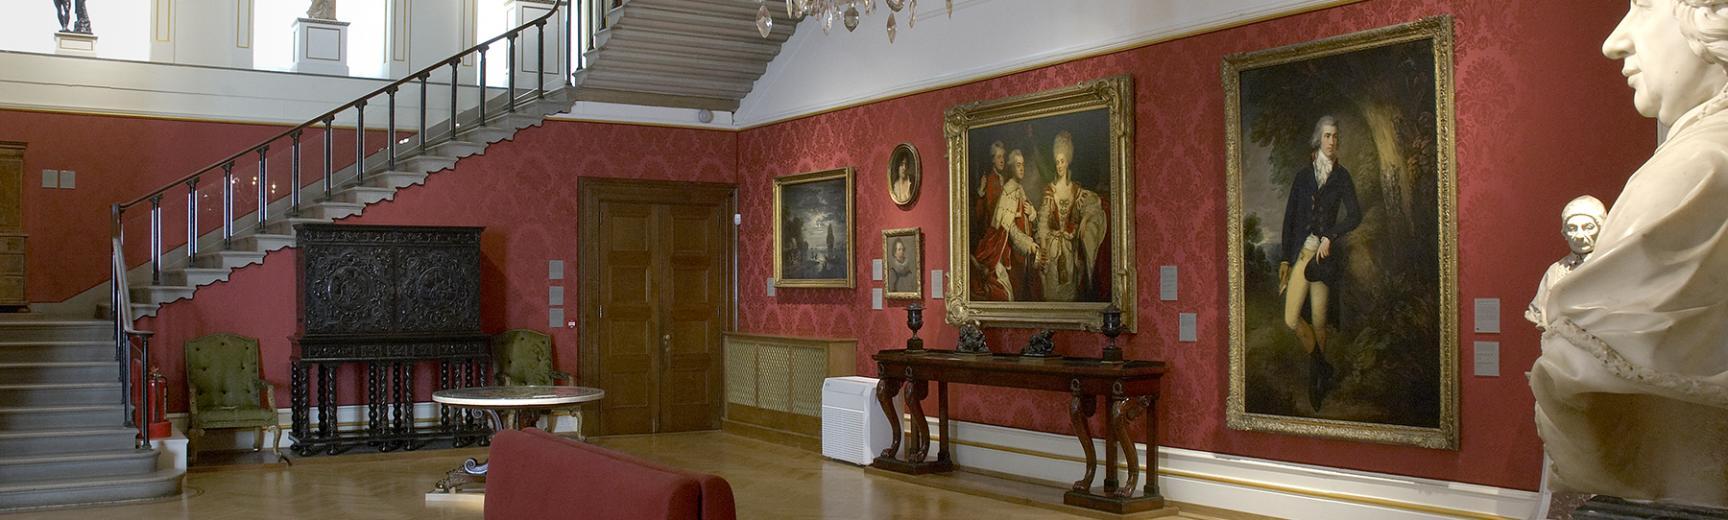 Mallett Gallery at the Ashmolean Museum